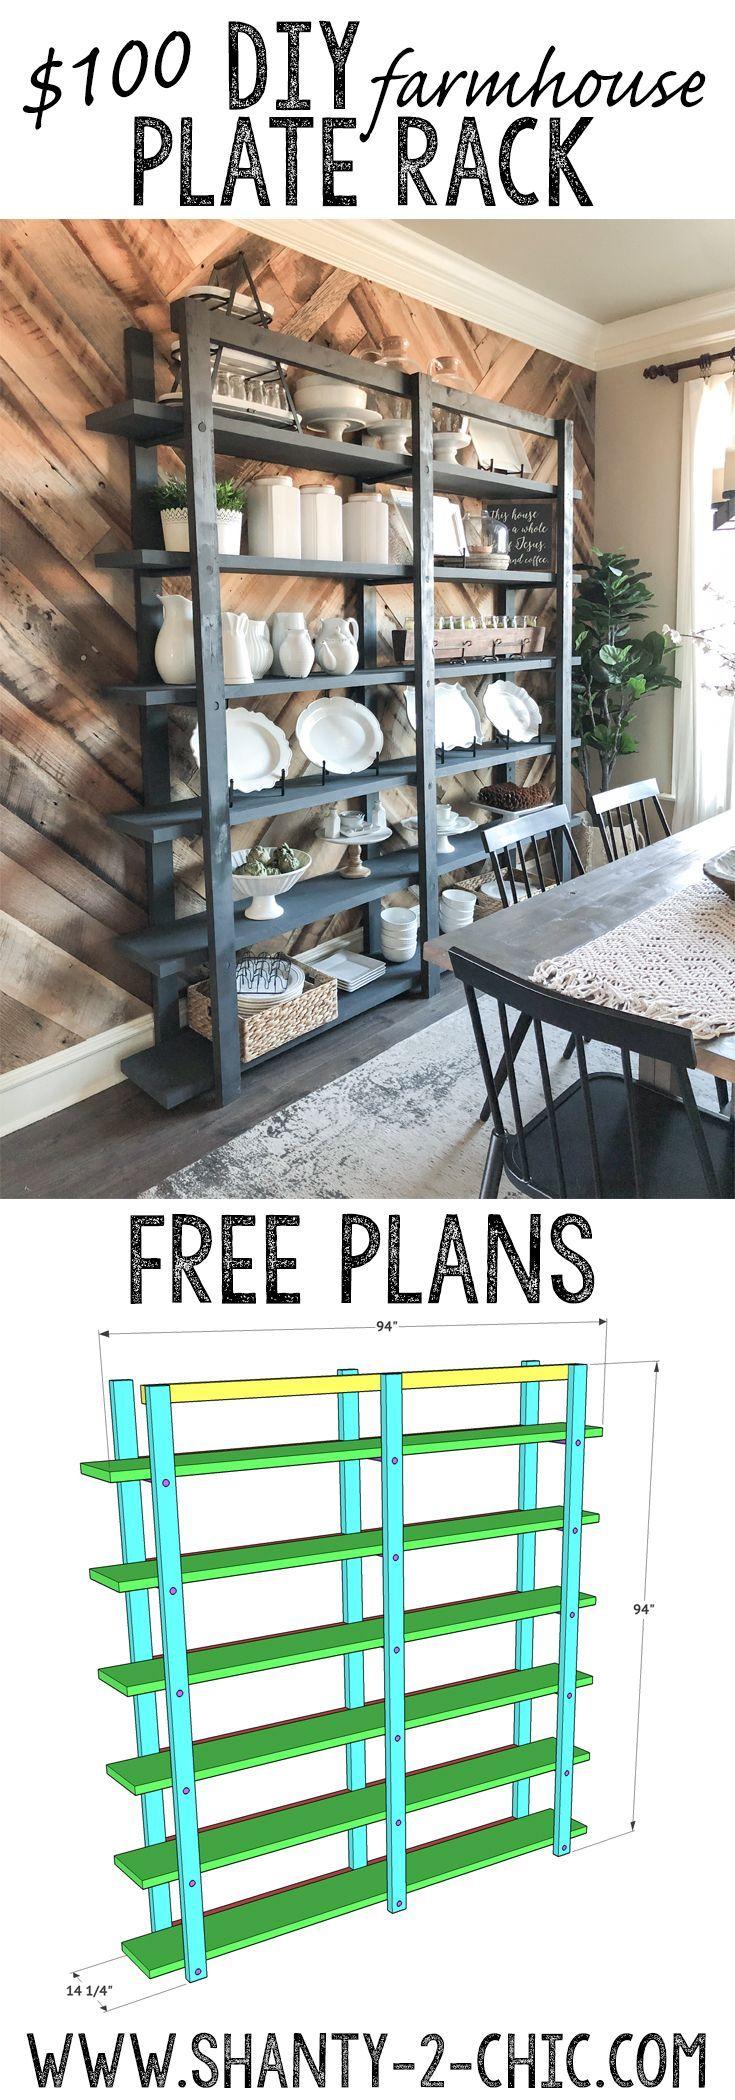 DIY Modern Farmhouse Plate Rack - Shanty 2 Chic